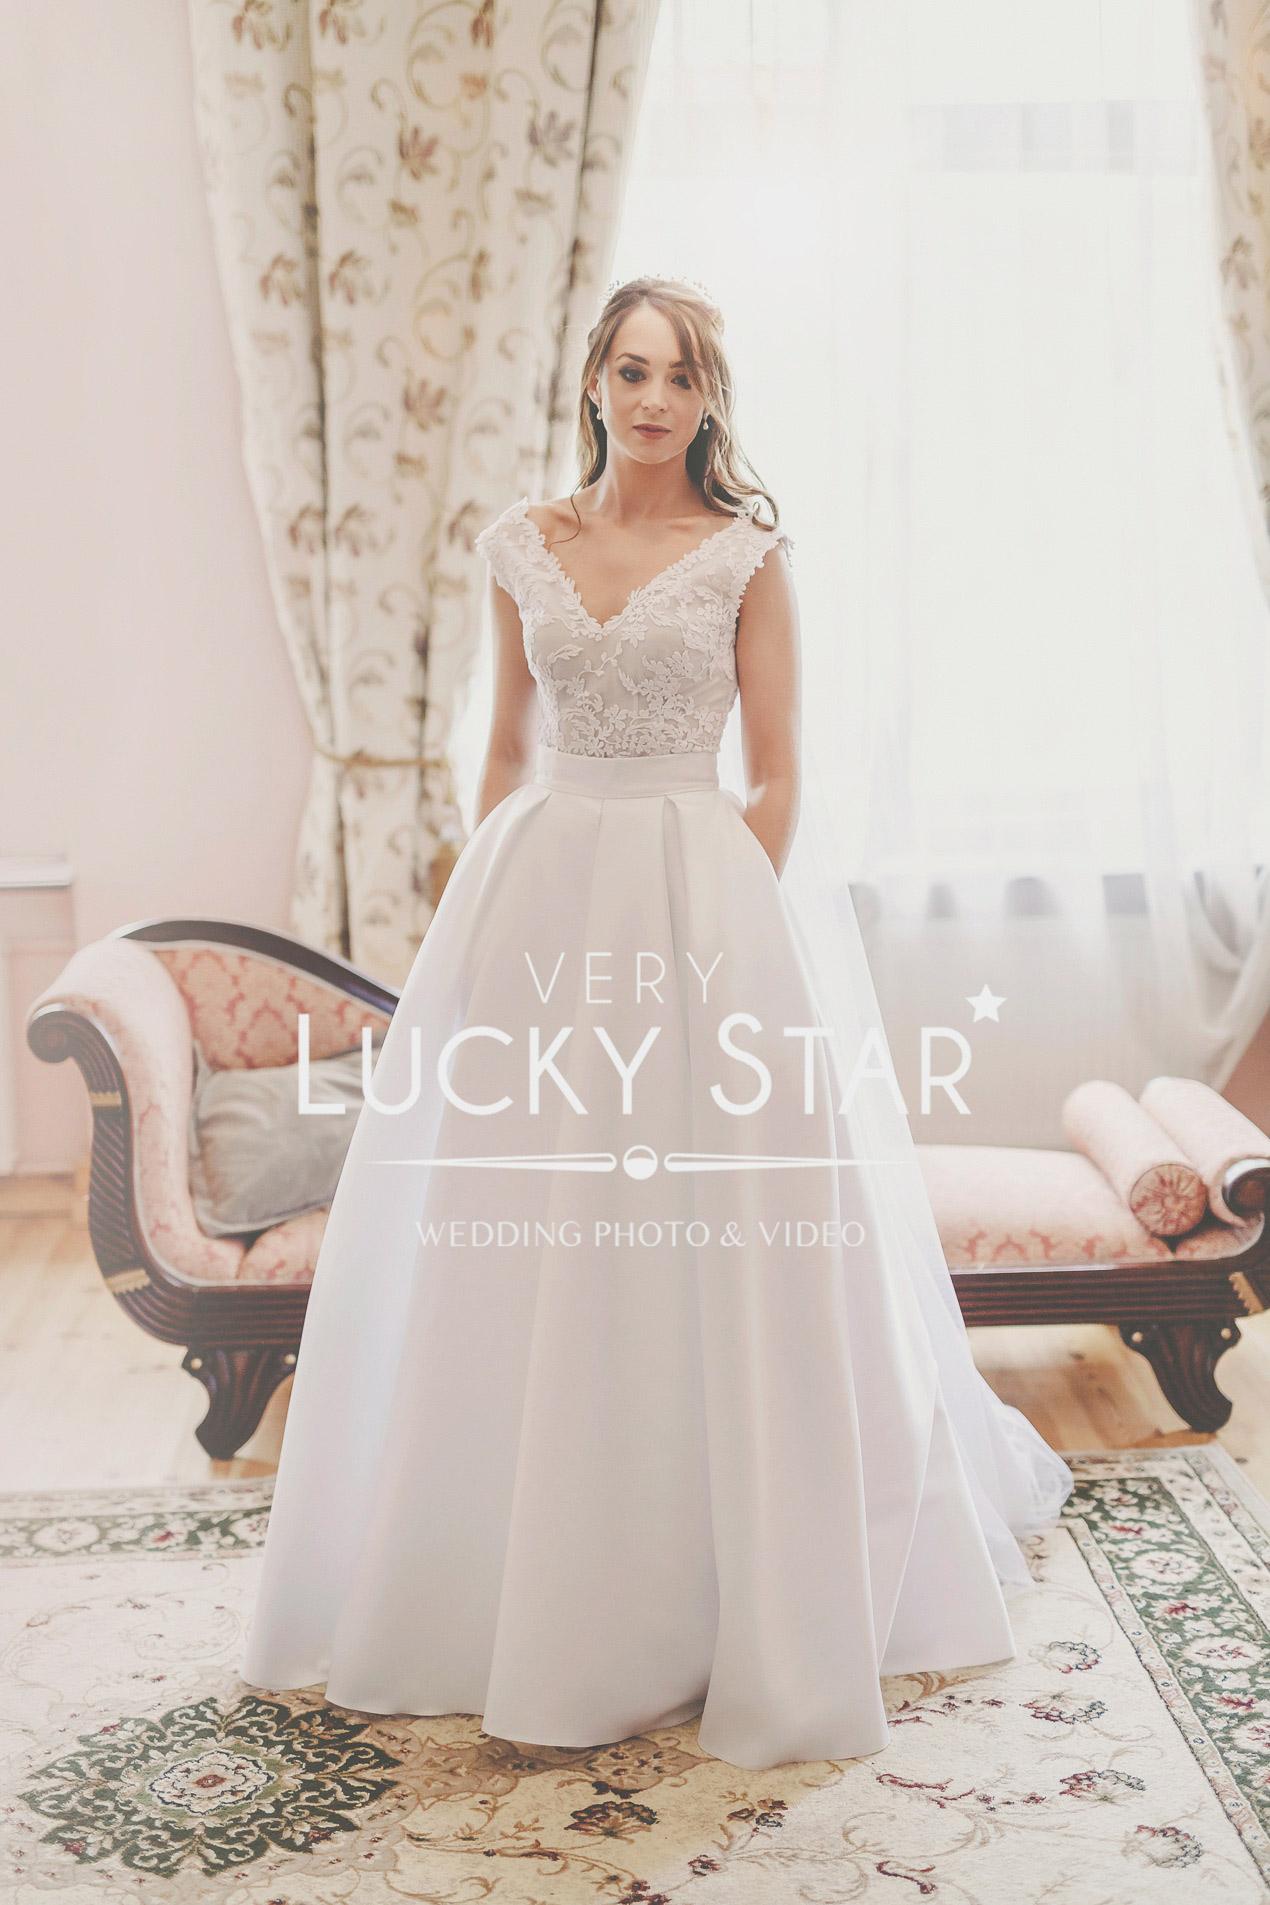 VeryLuckyStar_Palac_Wasowo_Fotograf_slub_wesele_panna_mloda